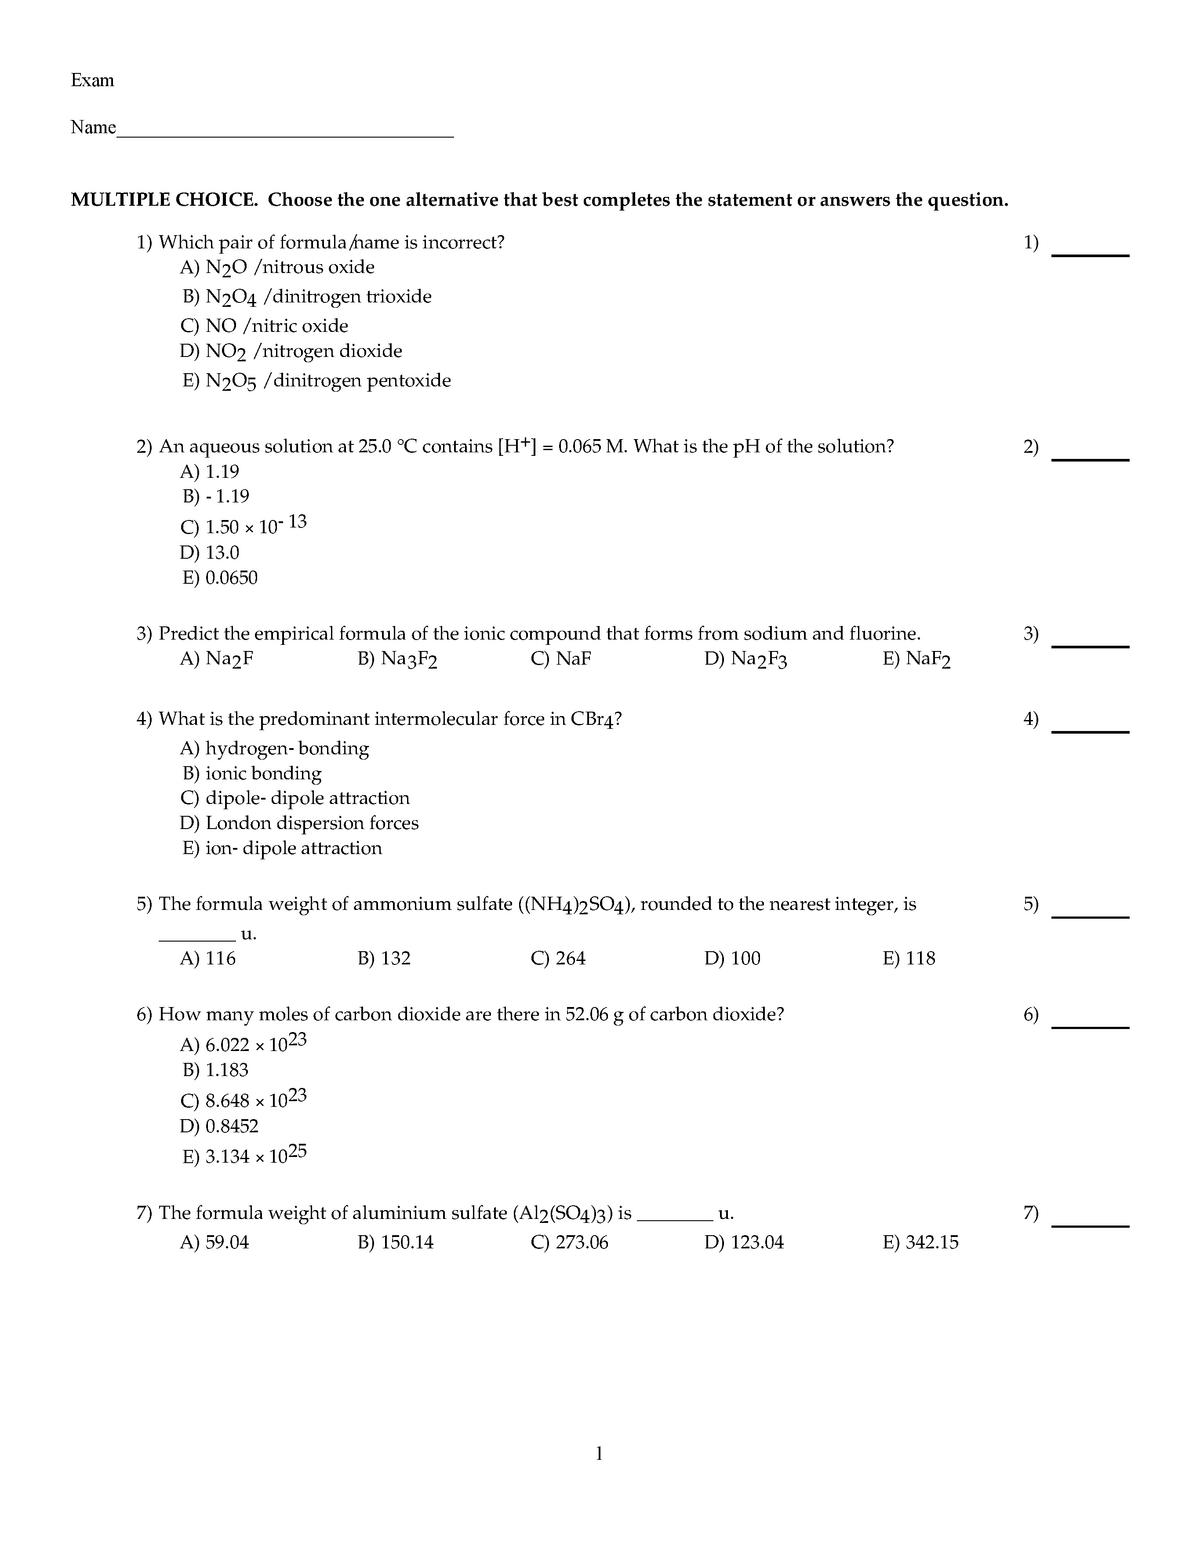 Exam 2011 - 033116 : Statistical Design and Analysis - StuDocu